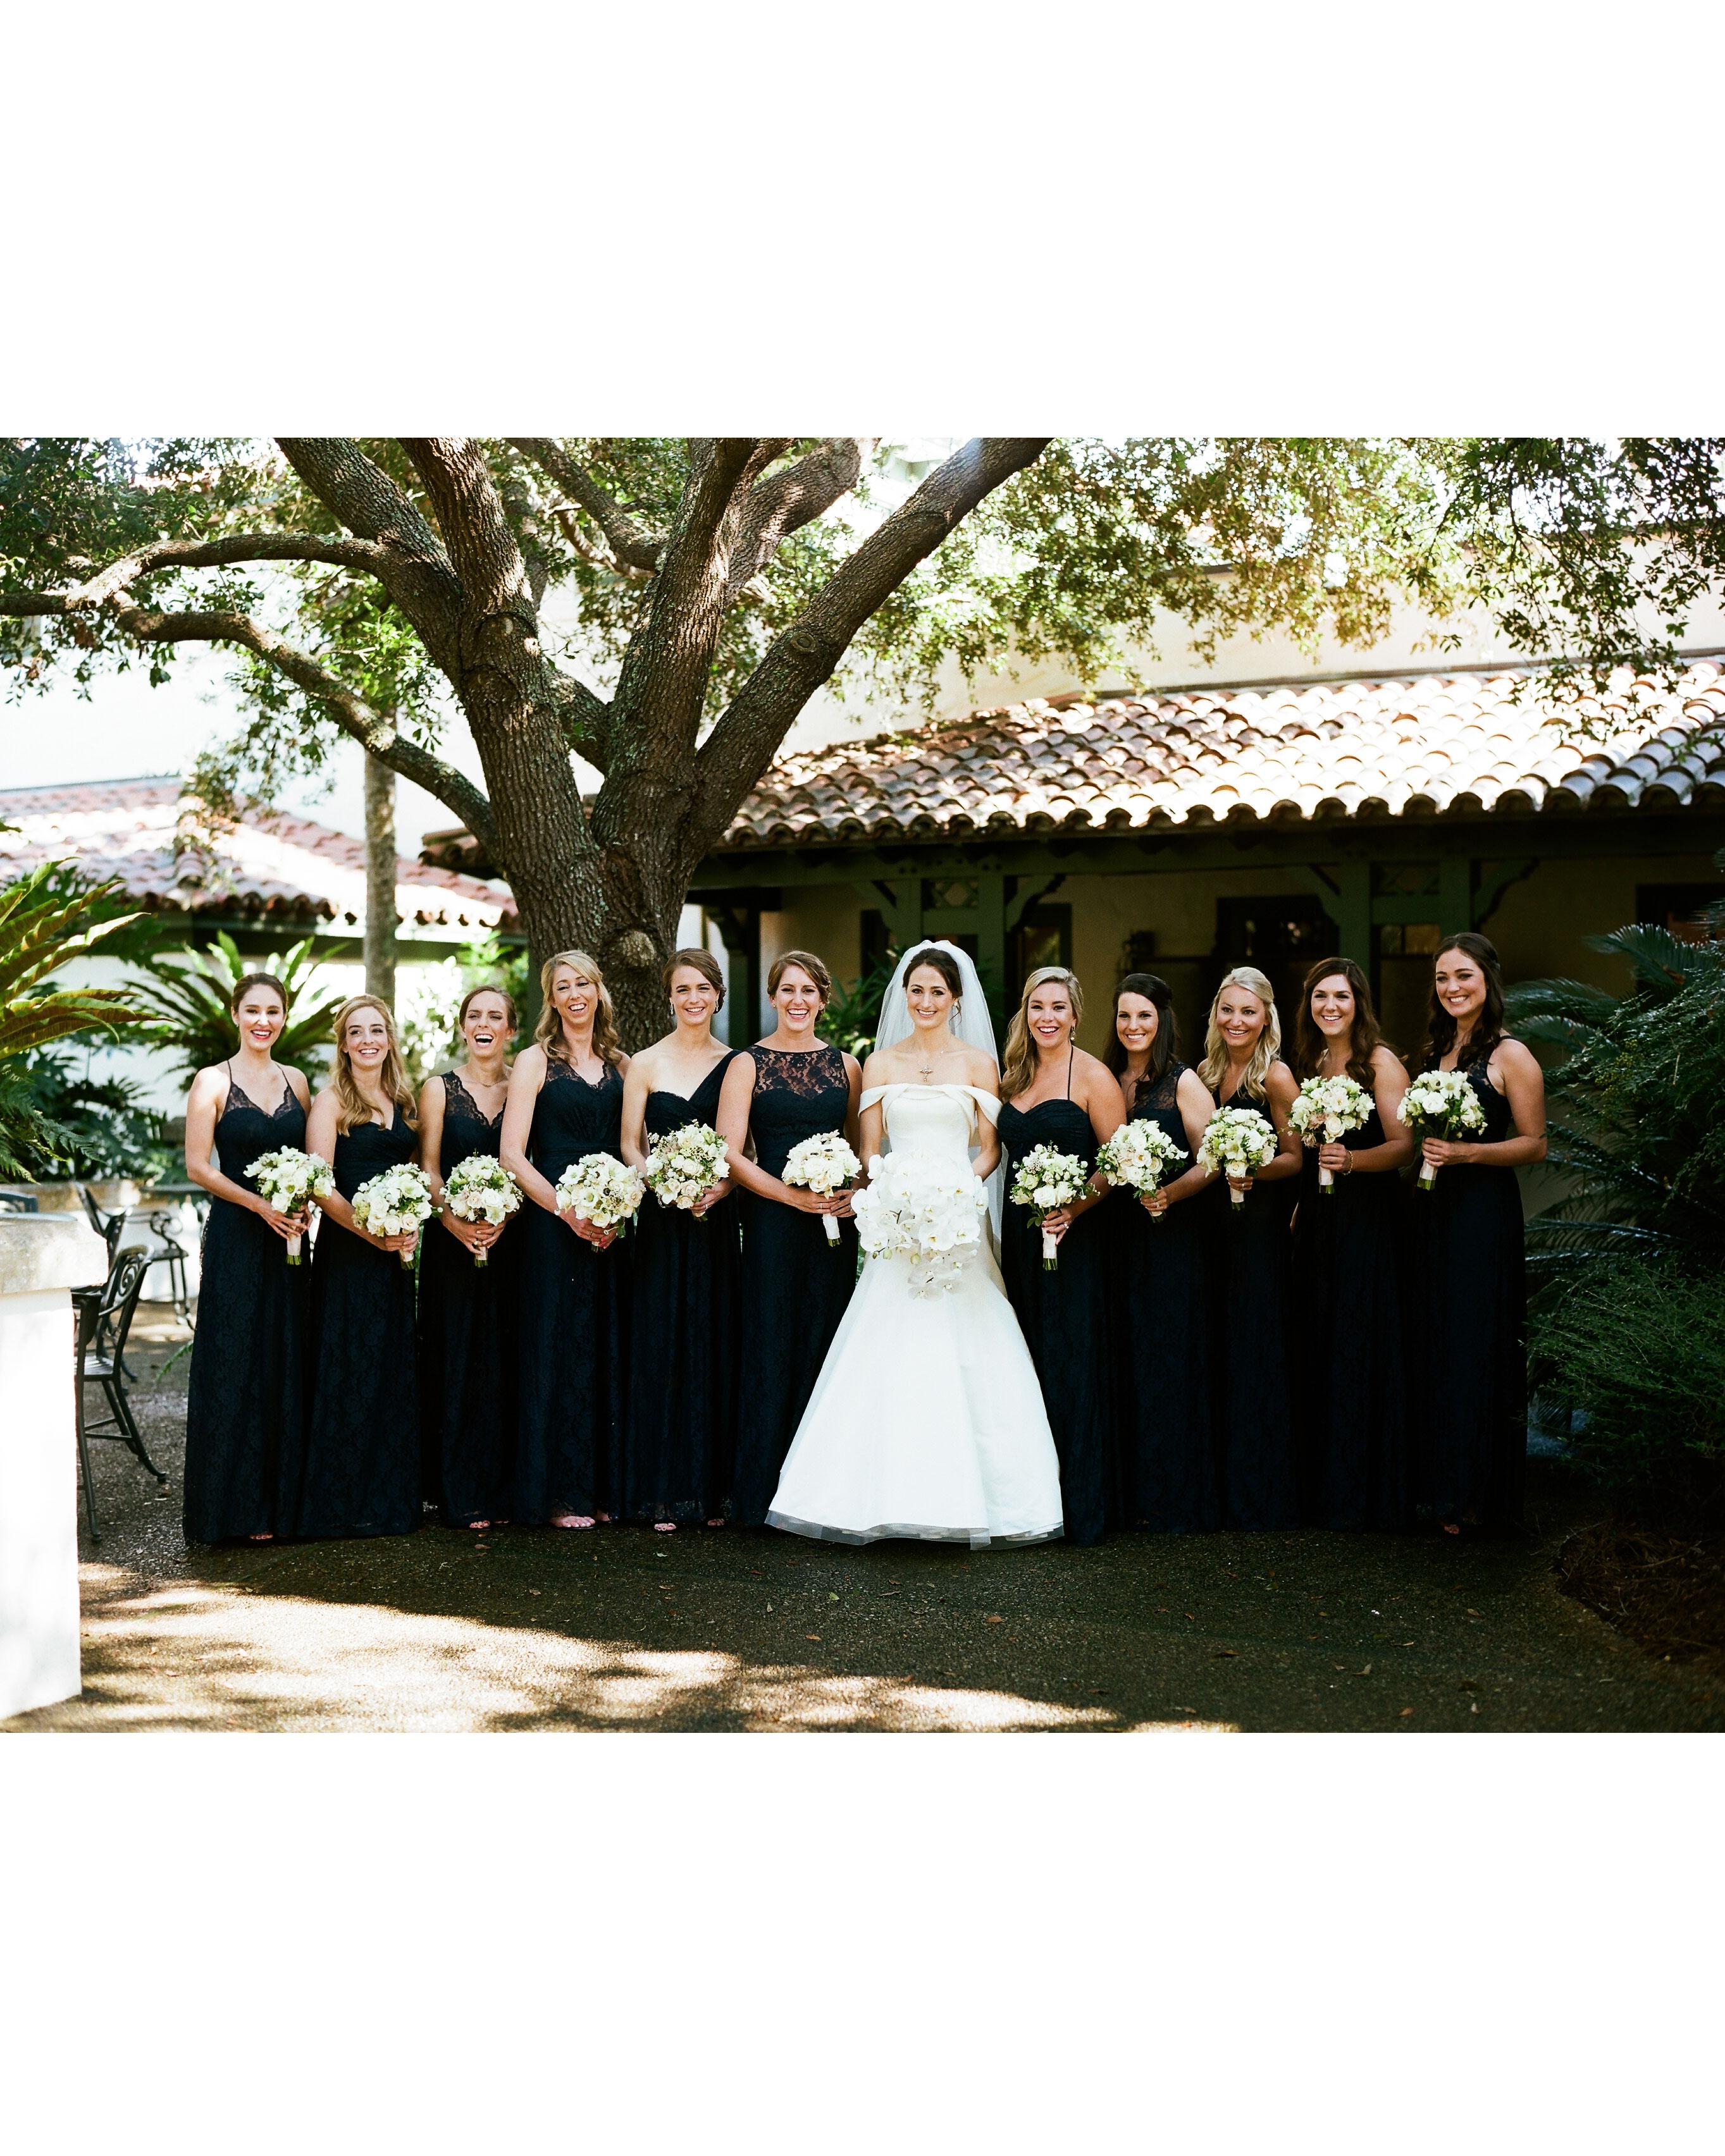 nancy-nathan-wedding-bridesmaids-0528-6141569-0816.jpg